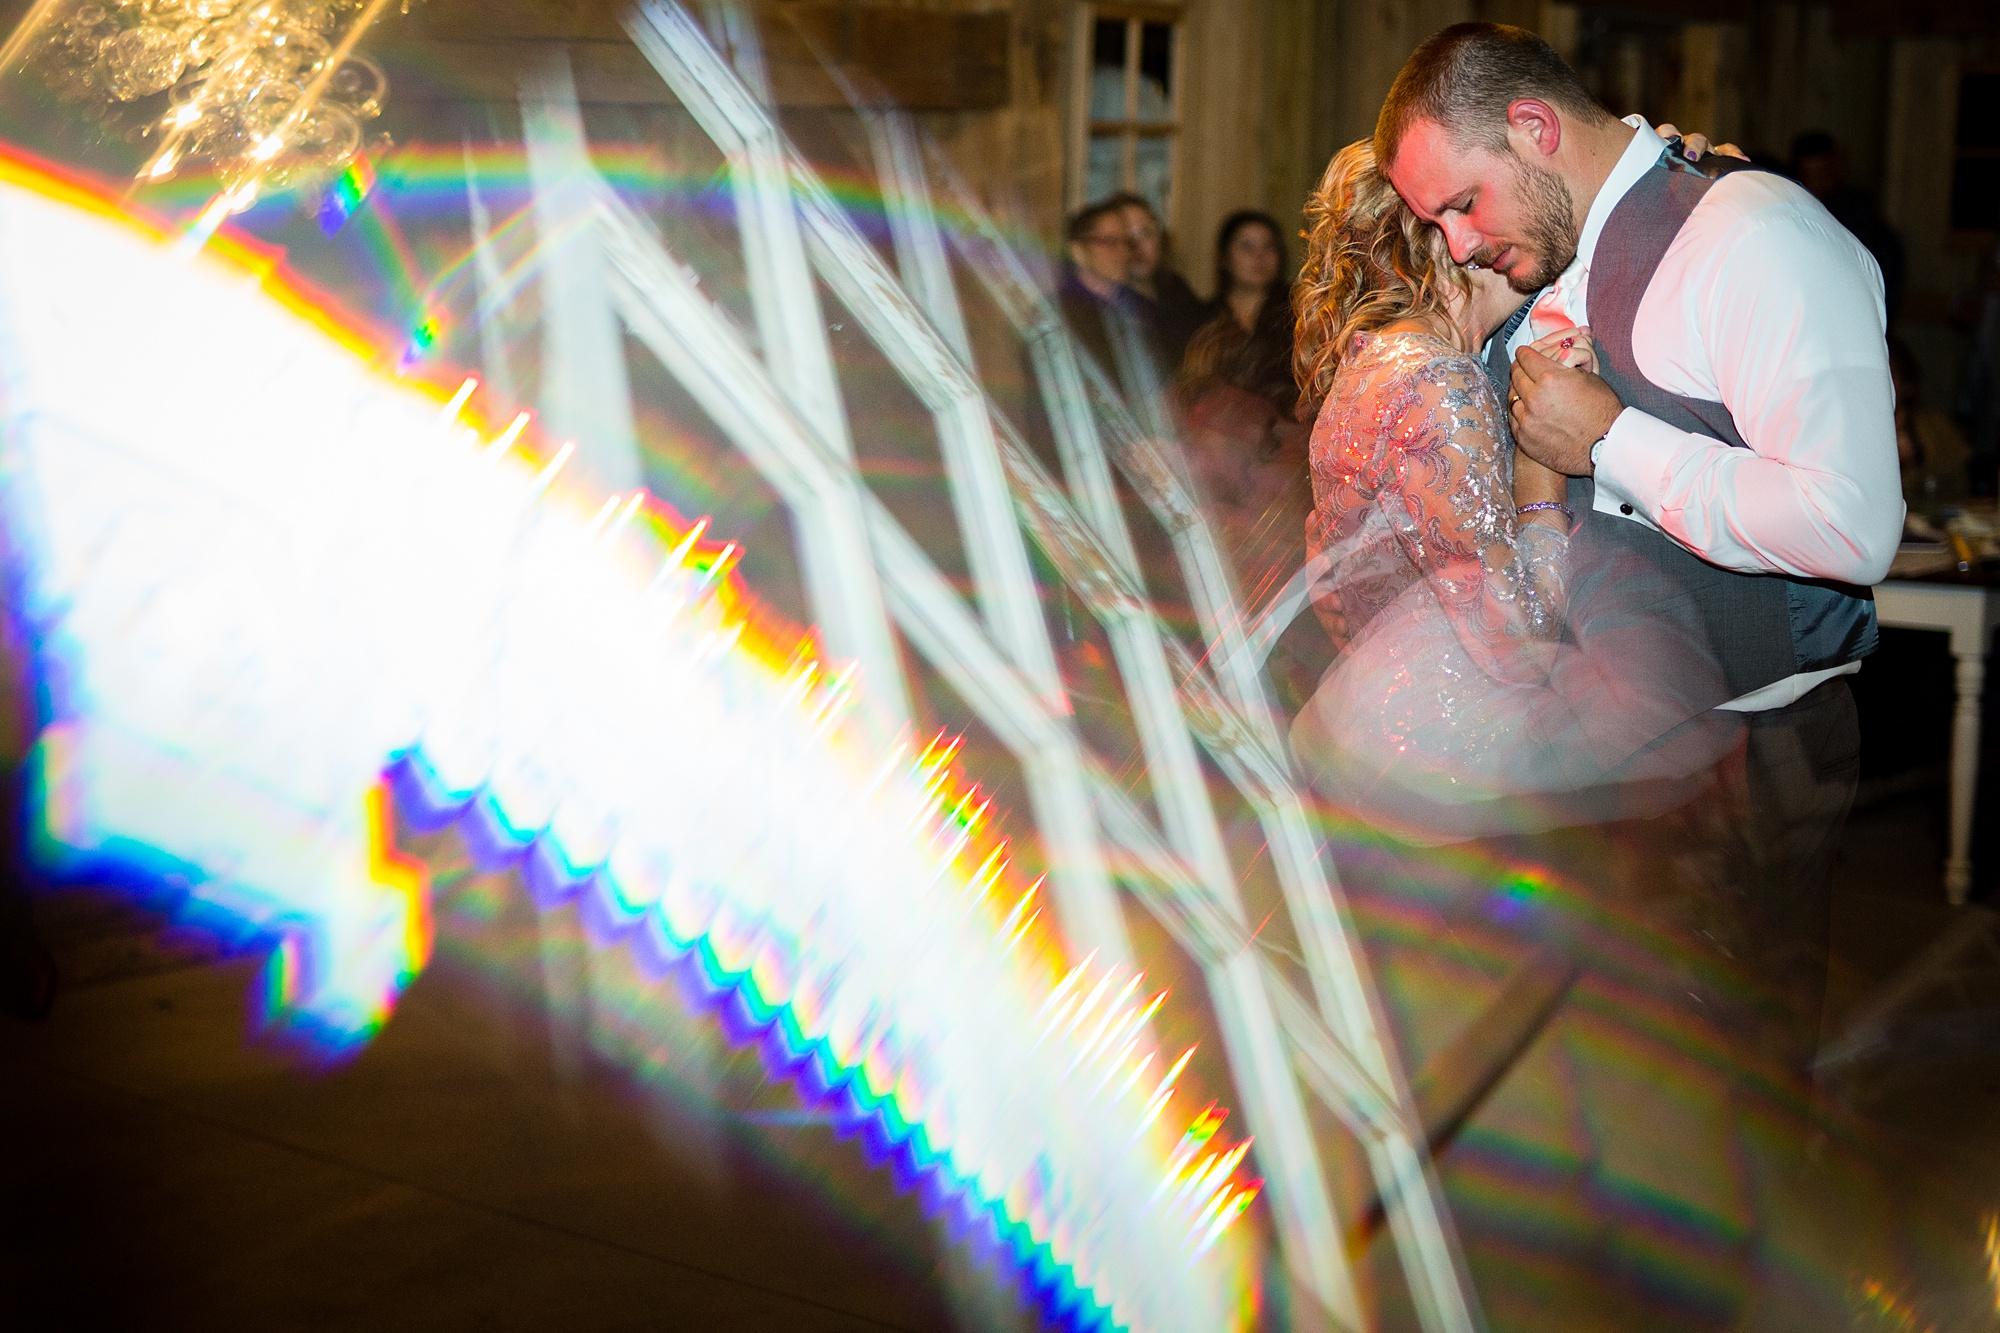 Brandon_Shafer_Photography_Emily_Travis_Kalamazoo_Wedding_Photography_0054.jpg